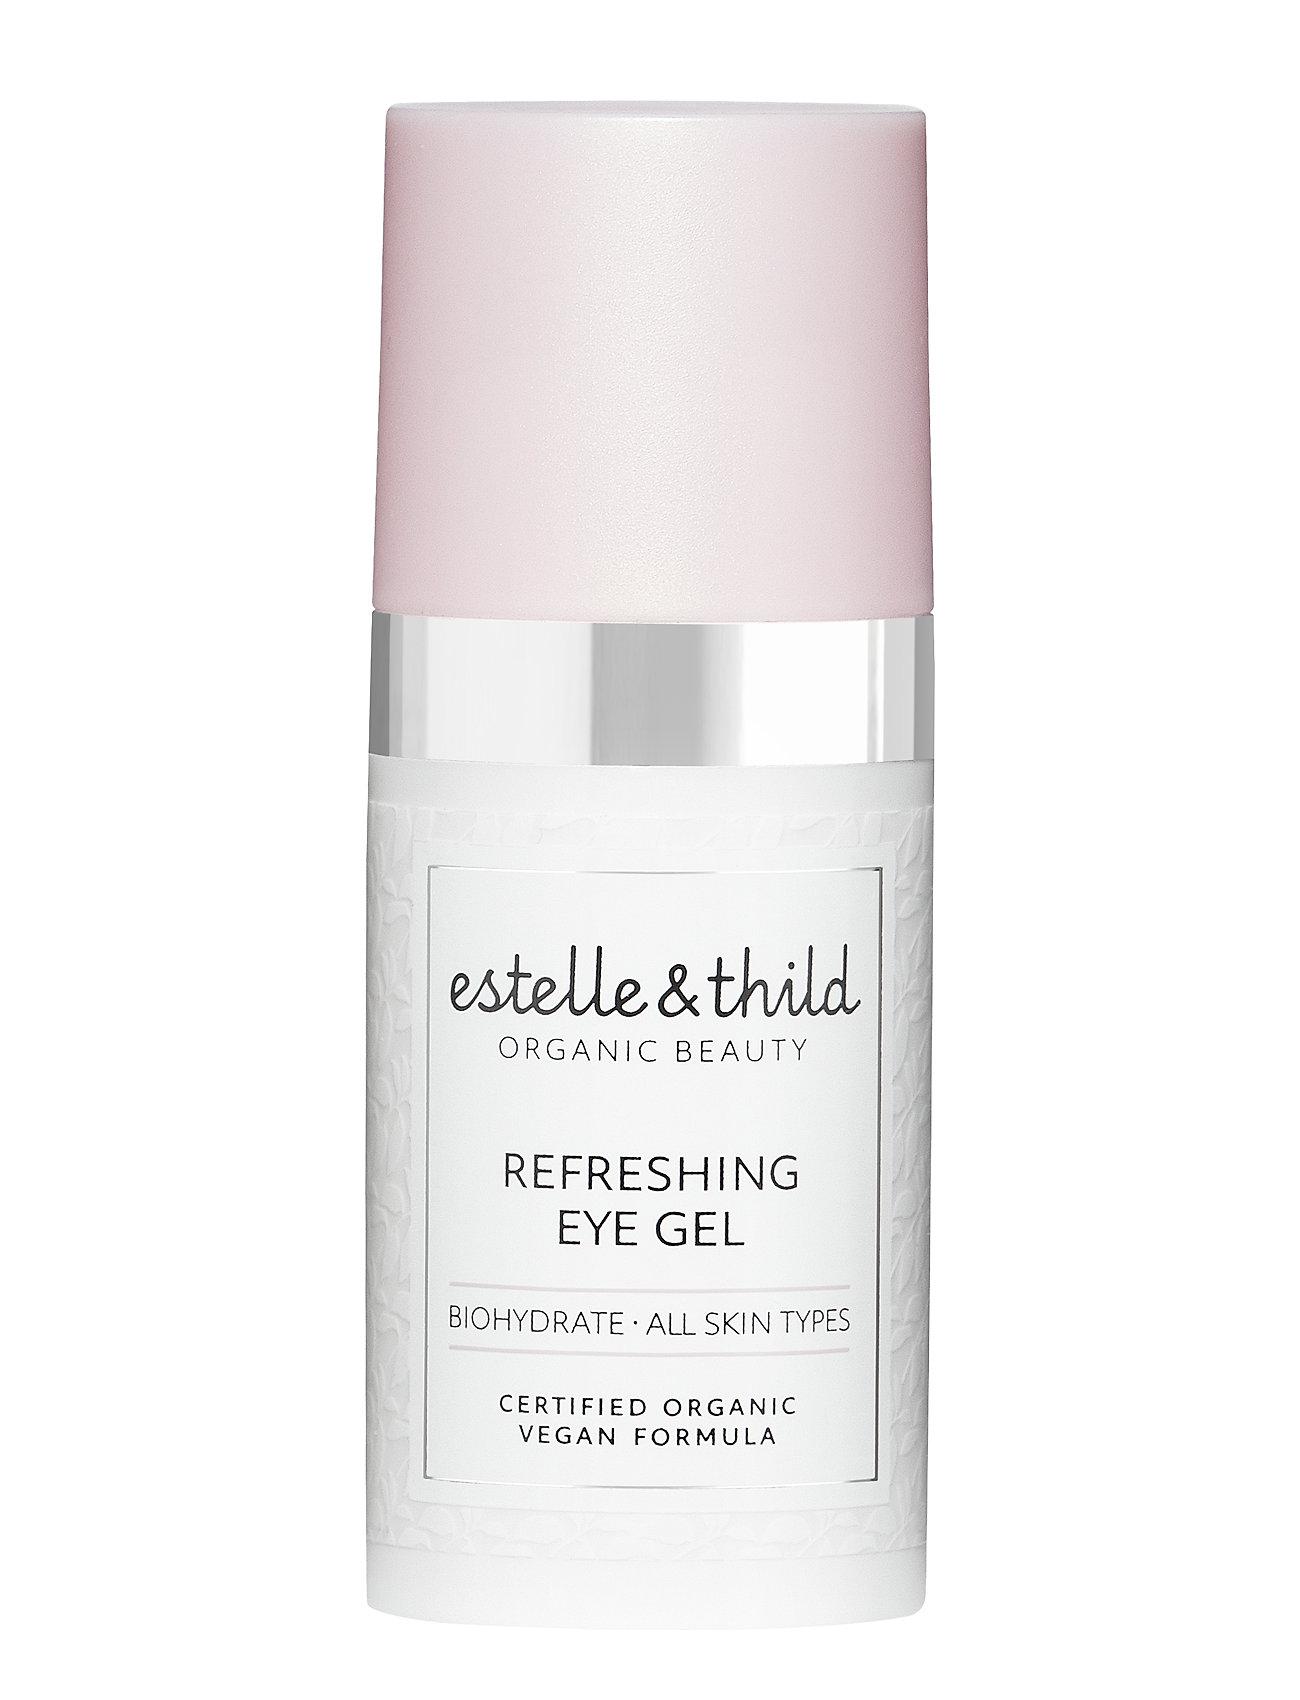 Biohydrate Refreshing Eye Gel - Estelle & Thild